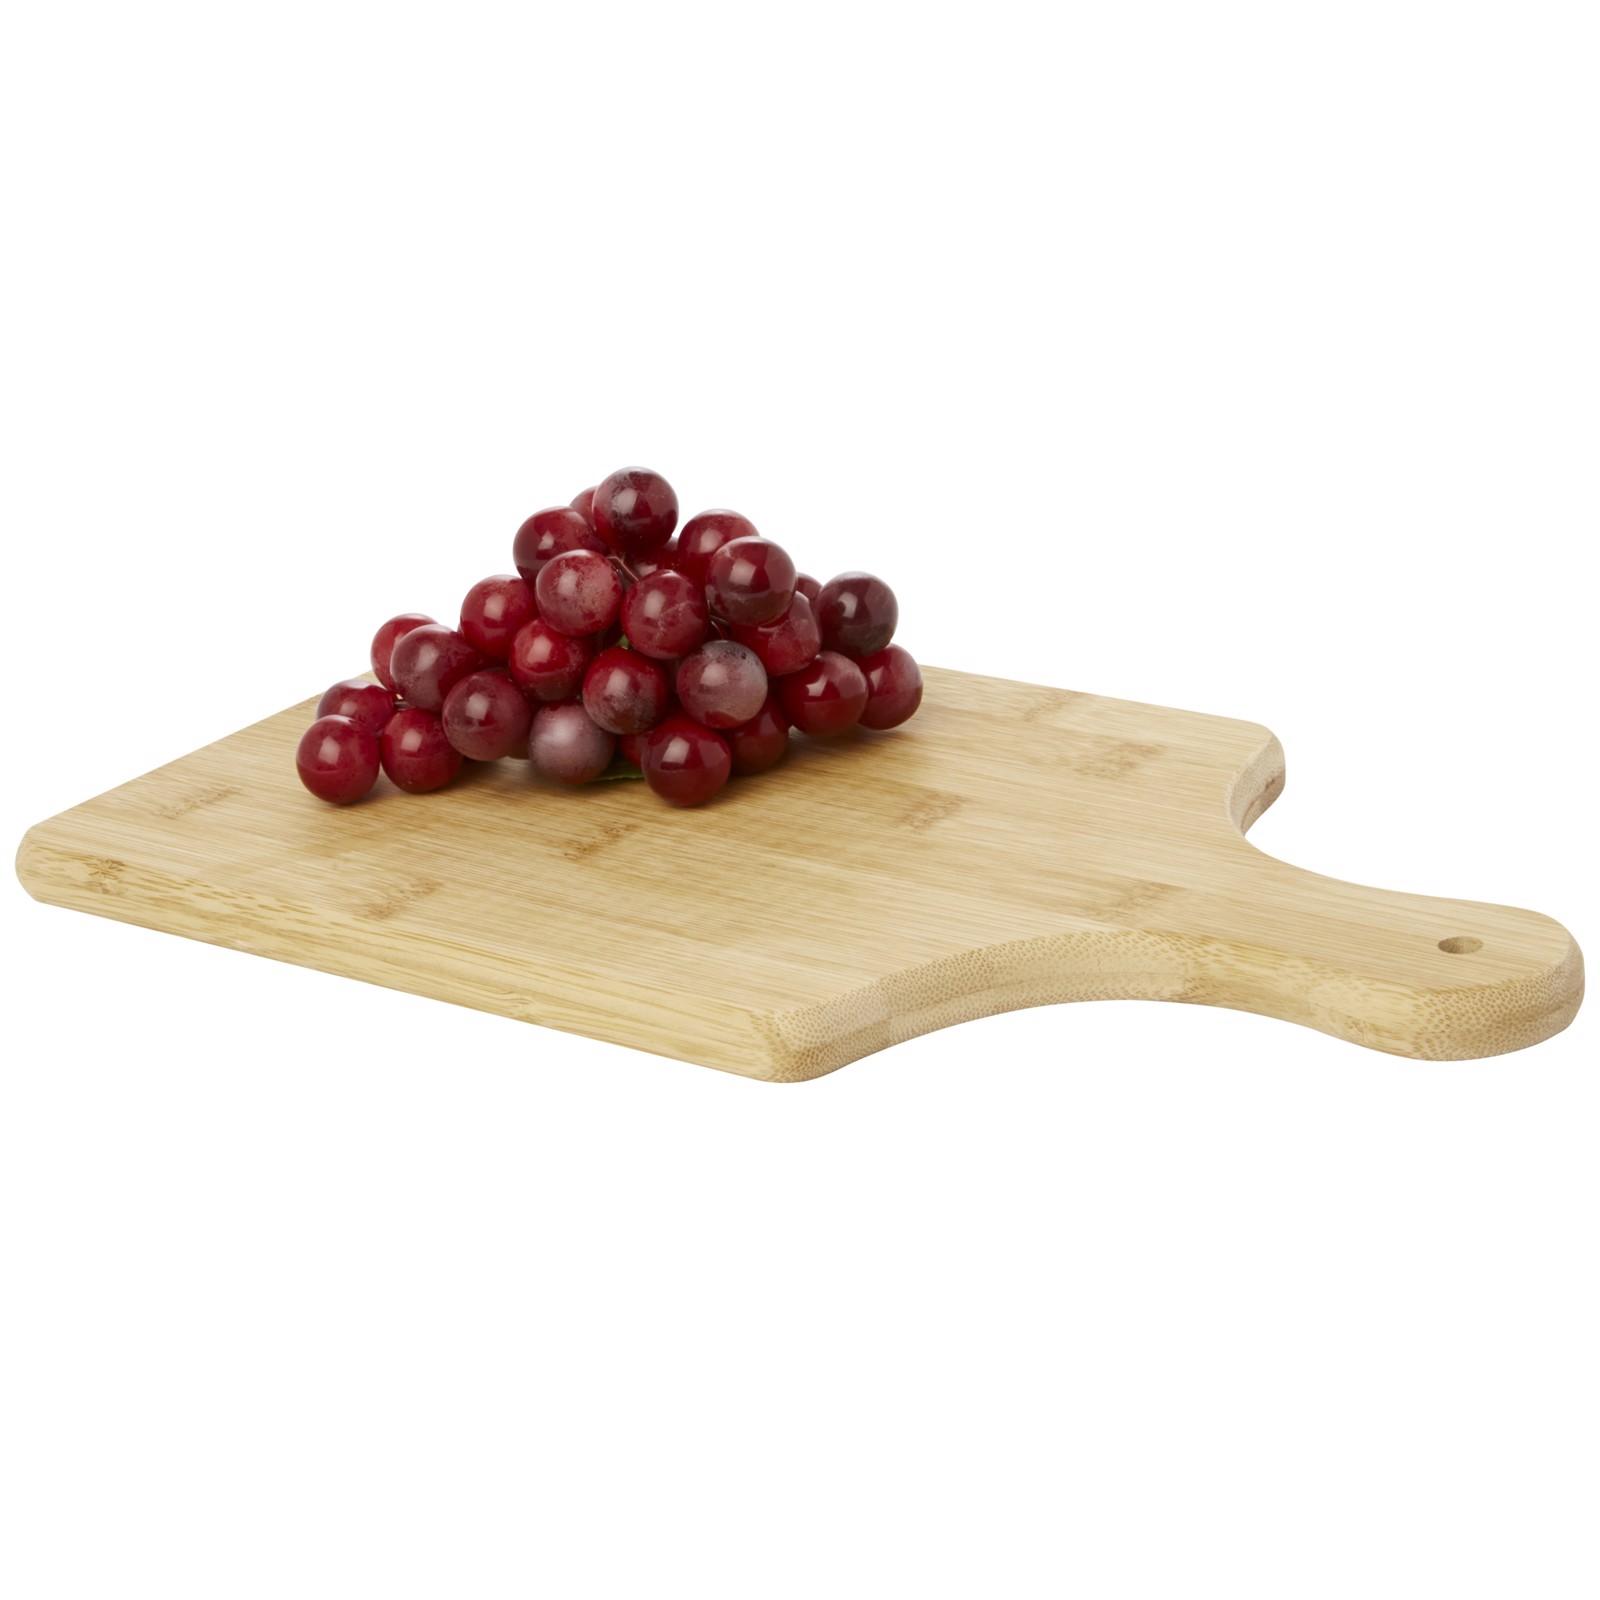 Quimet bamboo cutting board